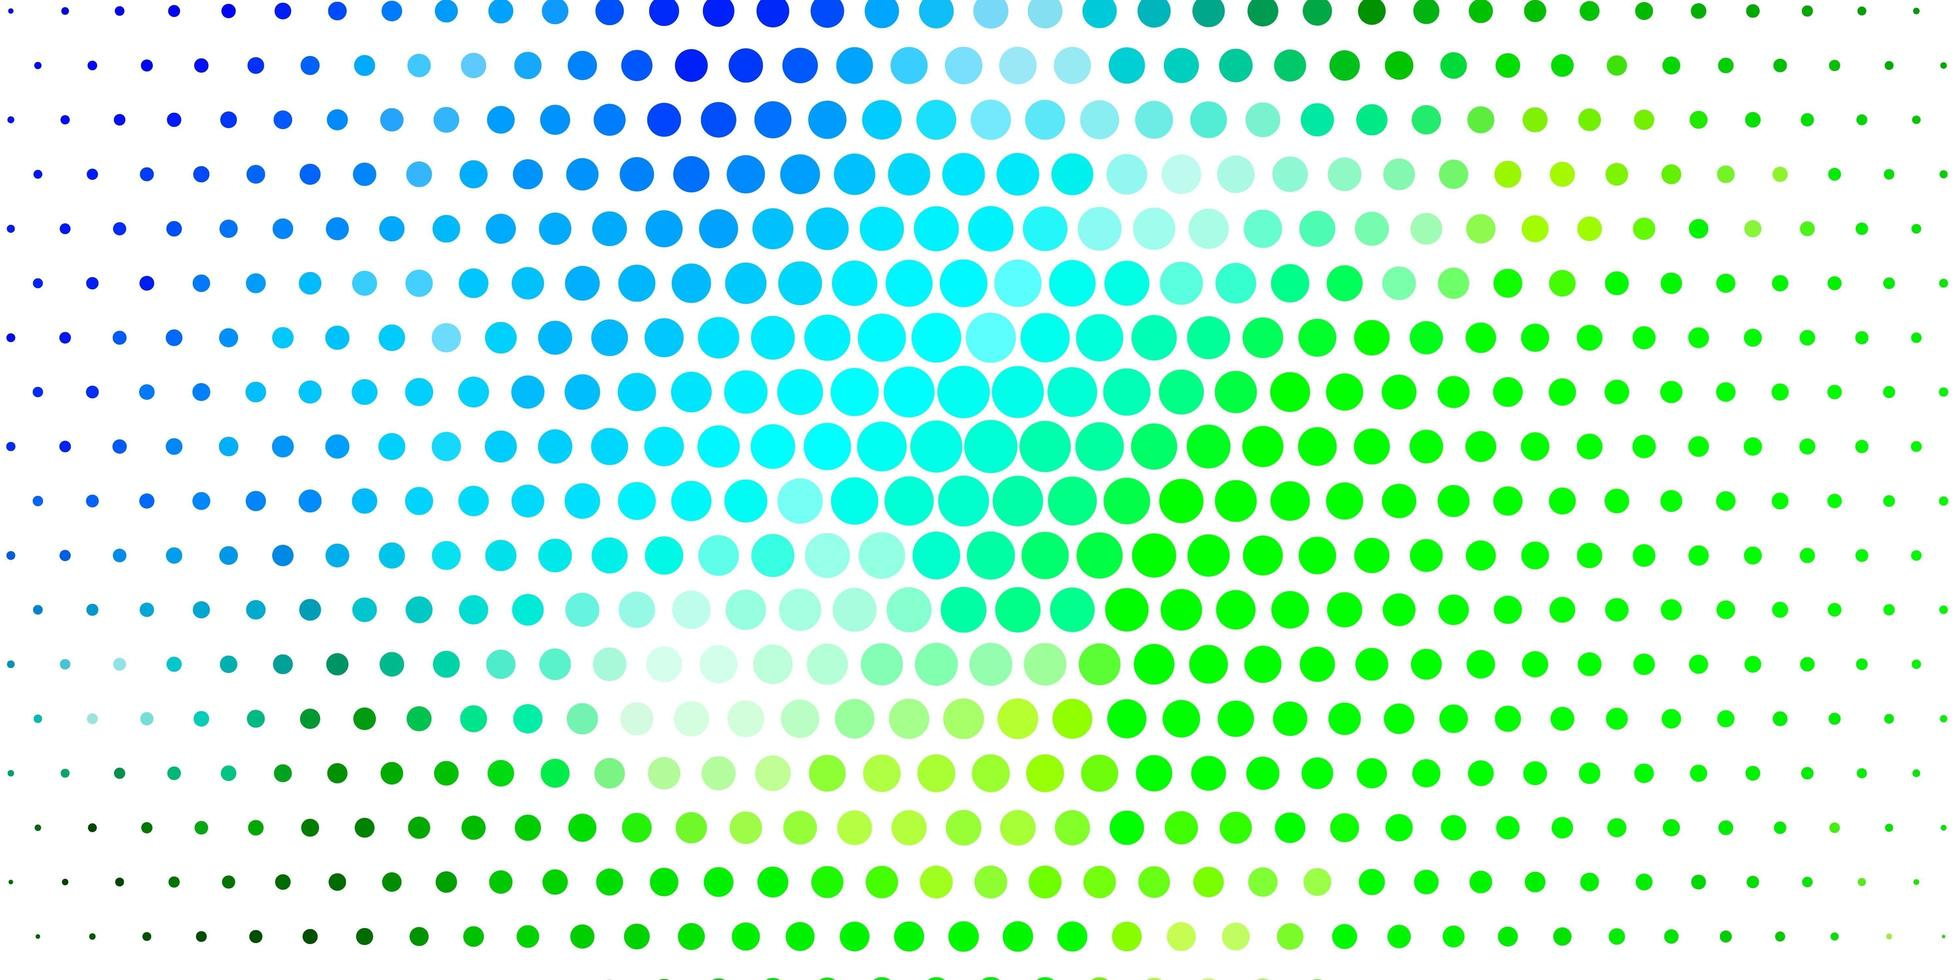 hellblaues, grünes Vektorlayout mit Kreisformen. vektor